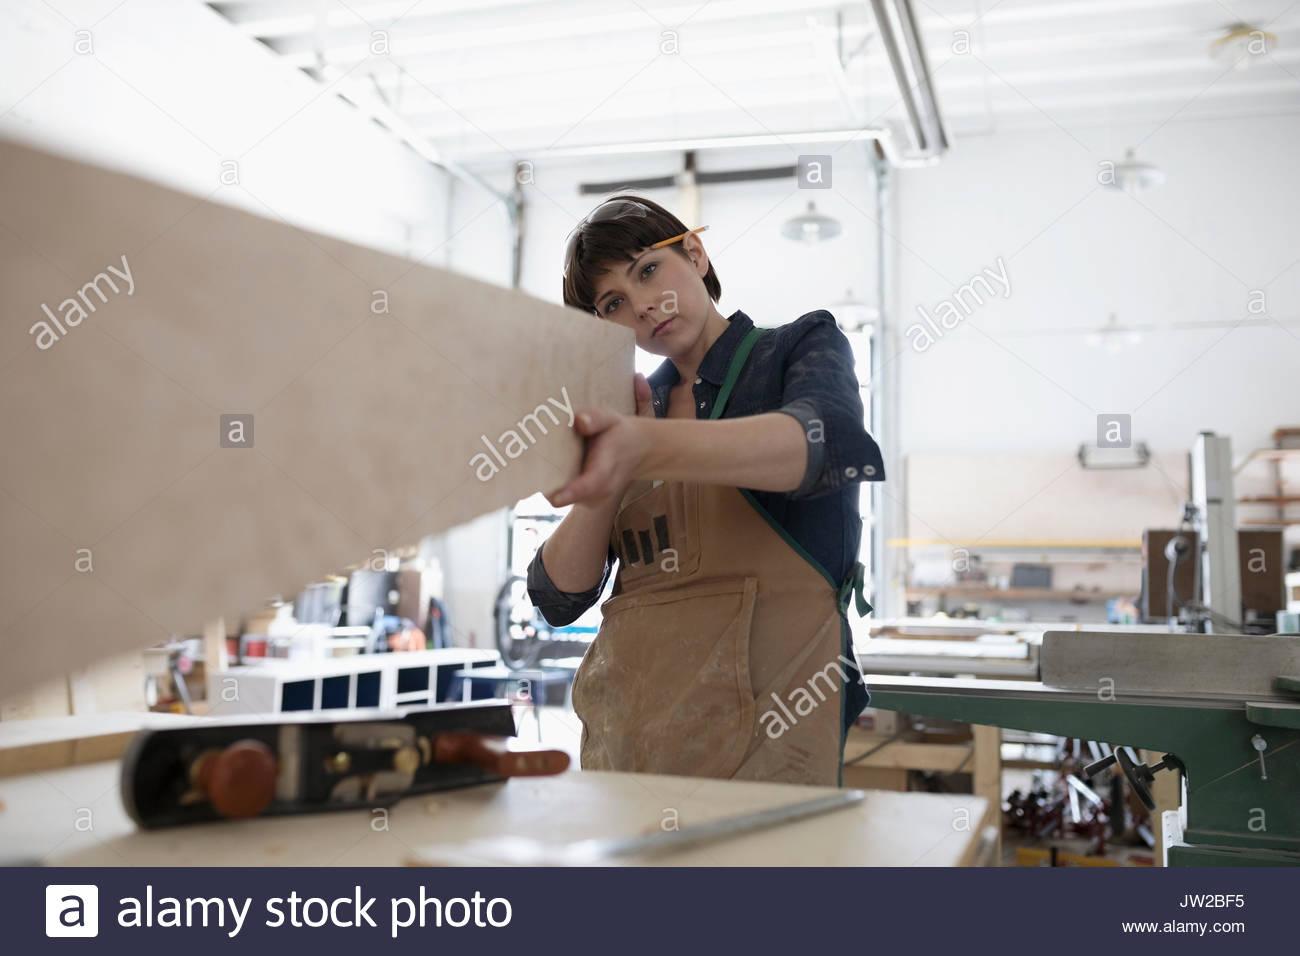 Focused female carpenter examining wood block in workshop - Stock Image